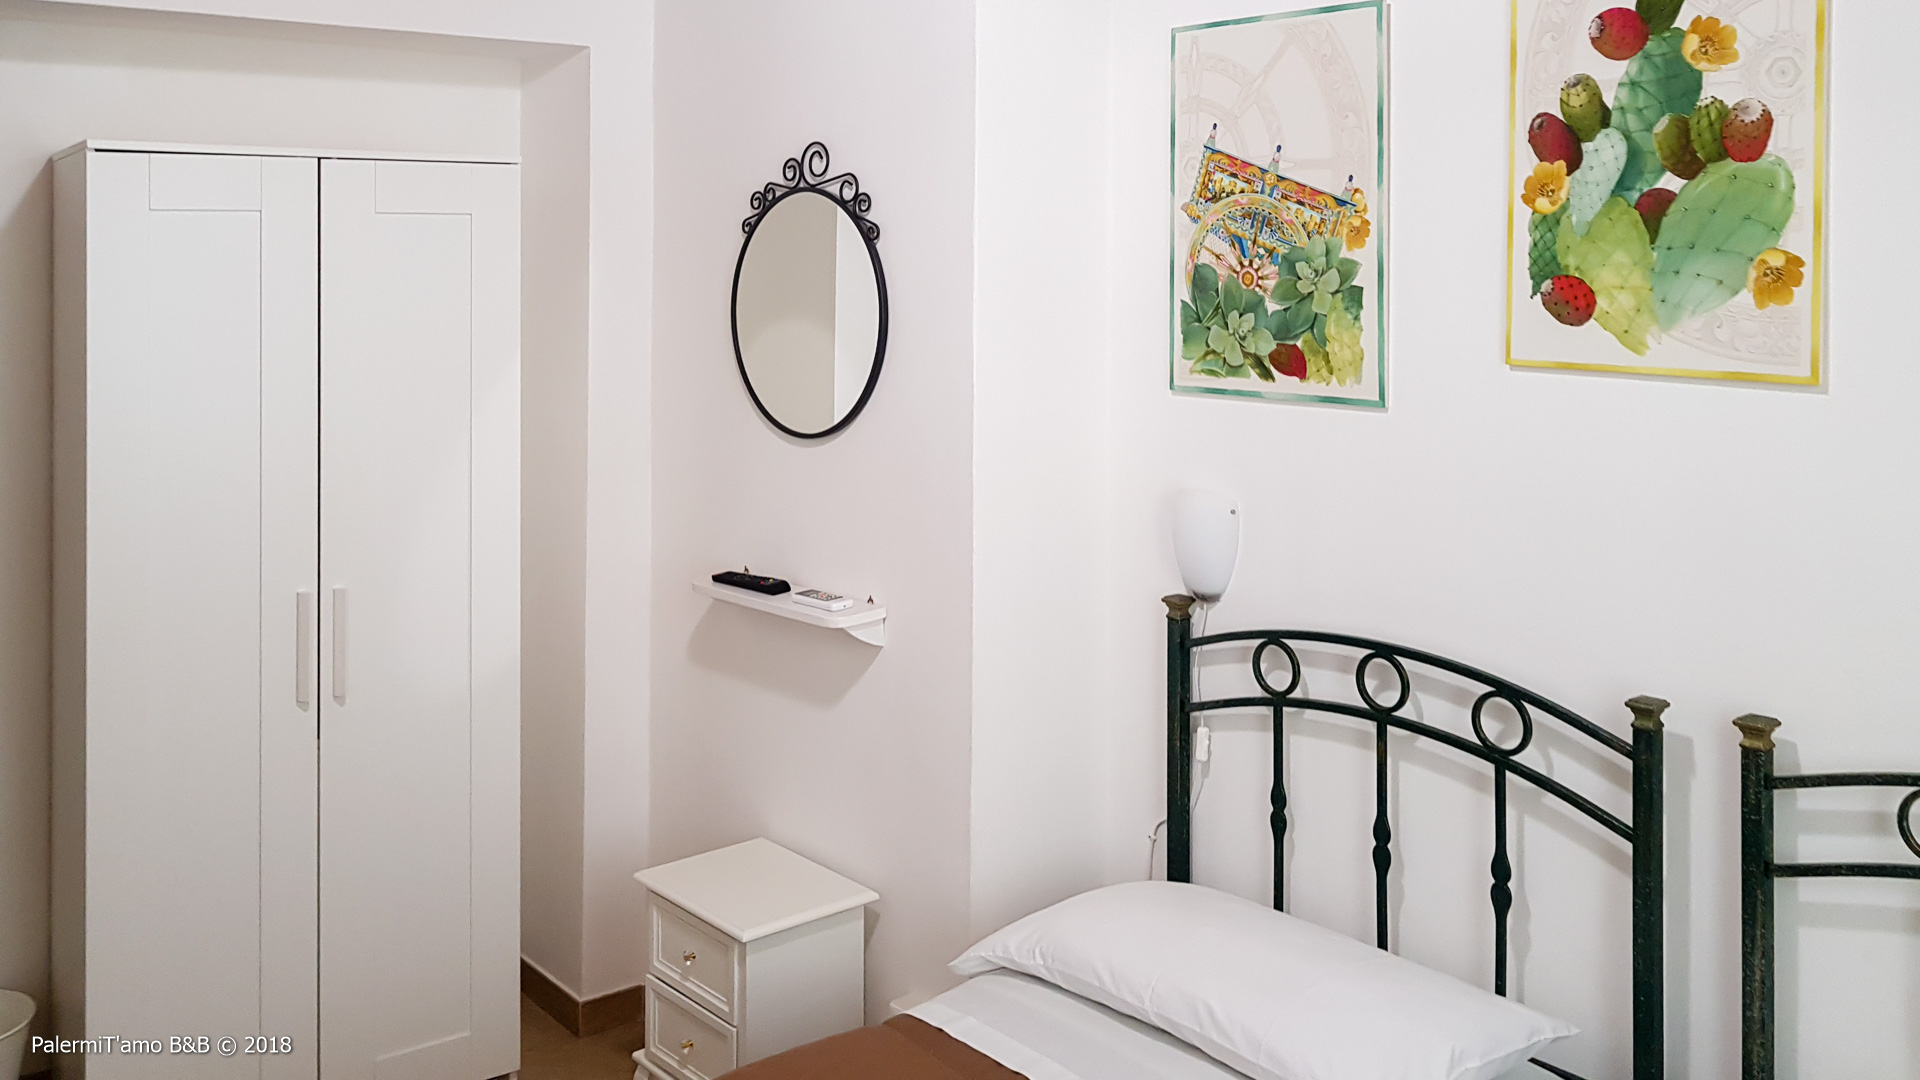 Appartamento PalermiT'amo